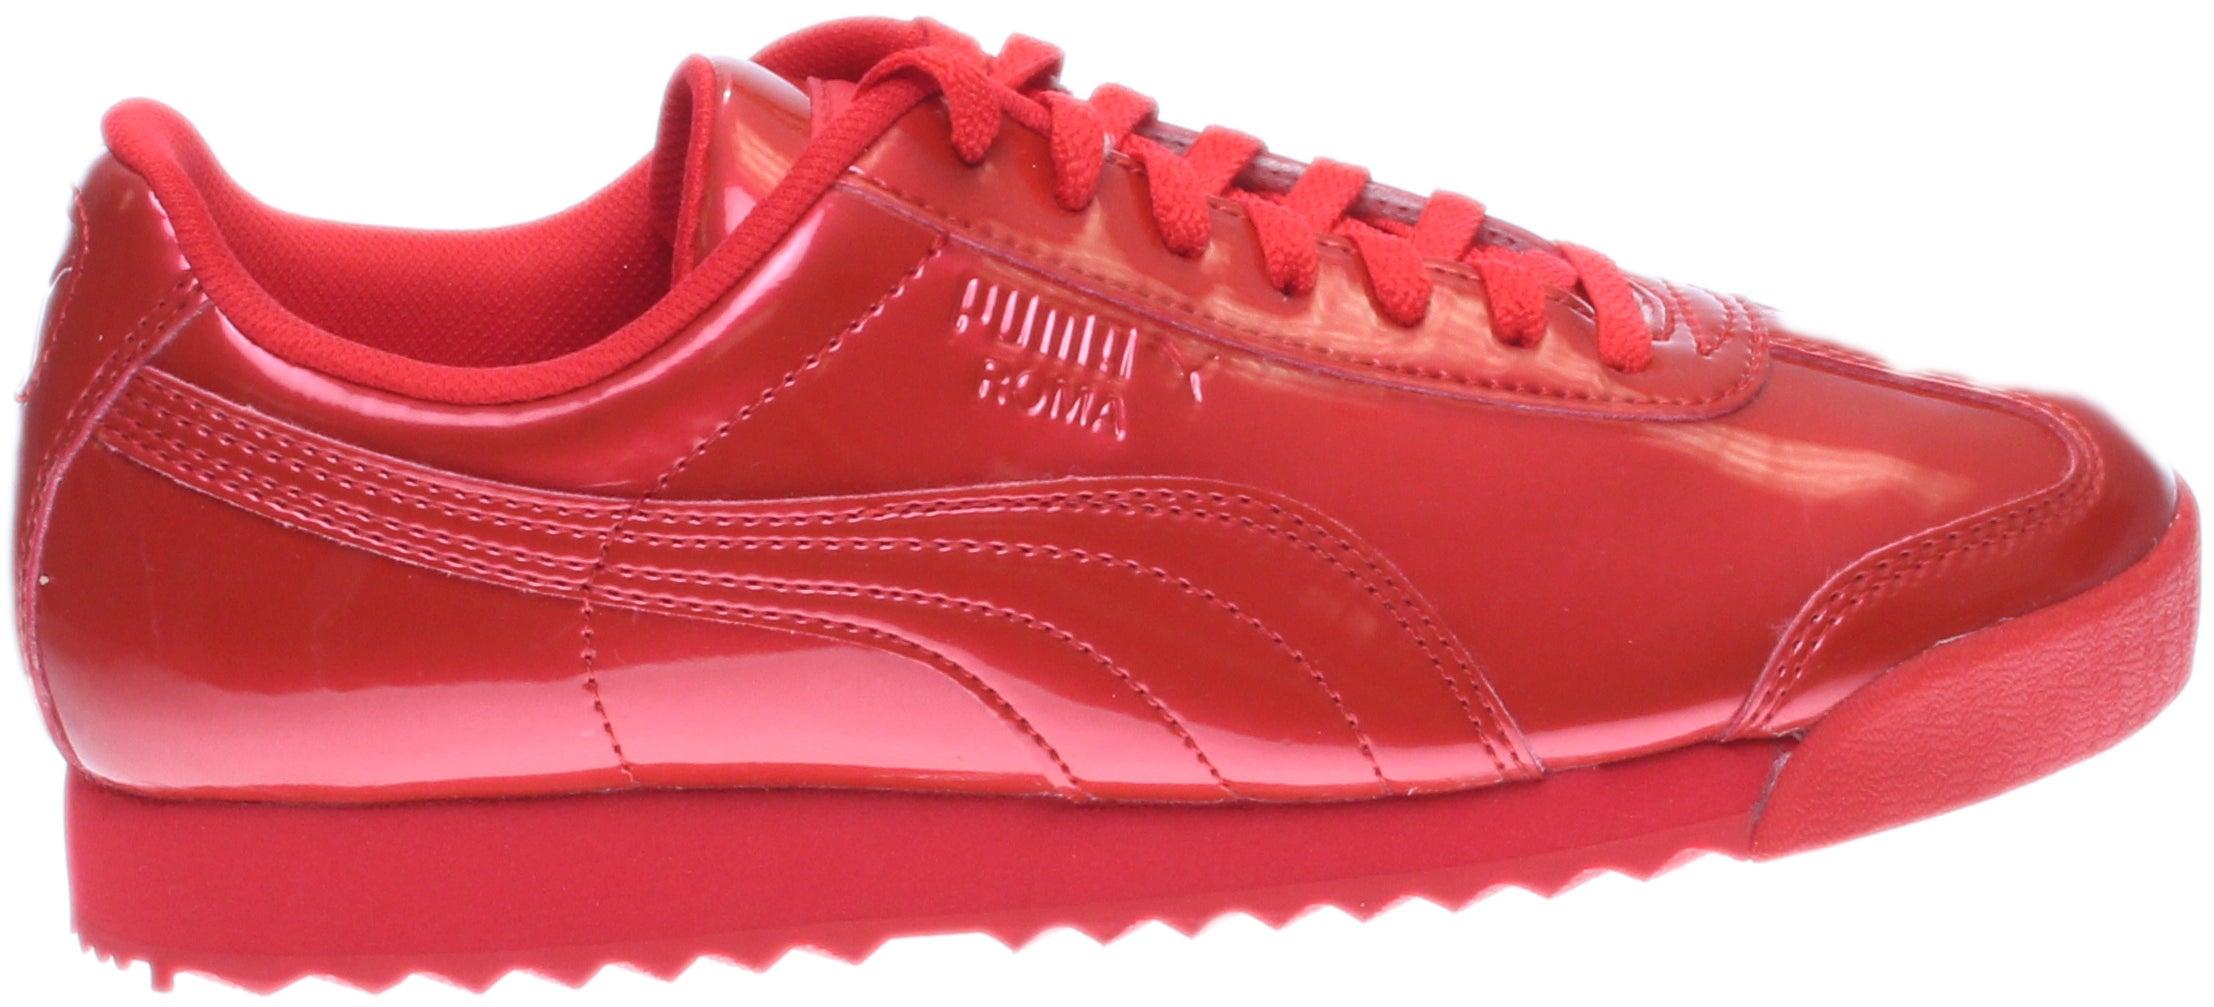 Puma Roma Patent JR Sneakers